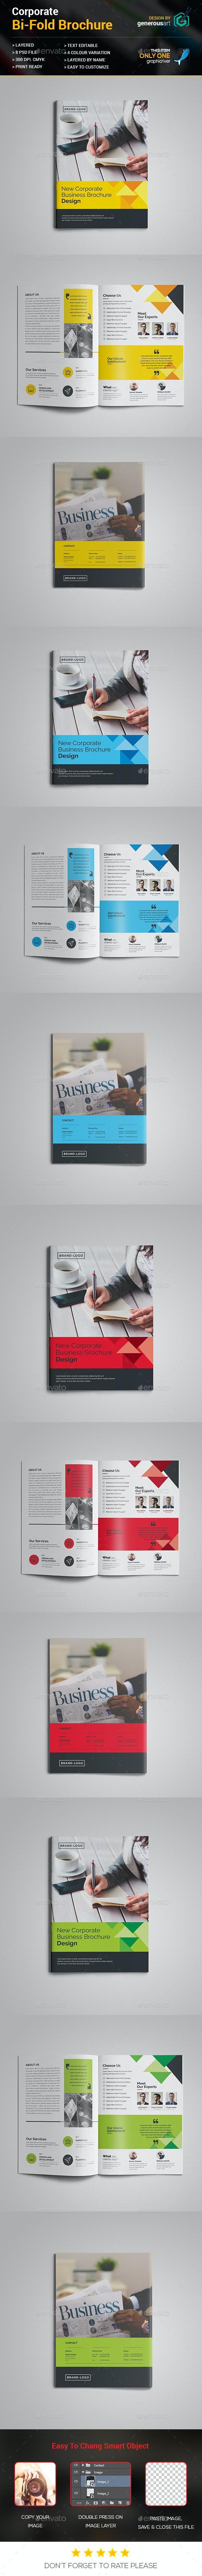 Bi-Fold Business Brochure_2 - Corporate Brochures